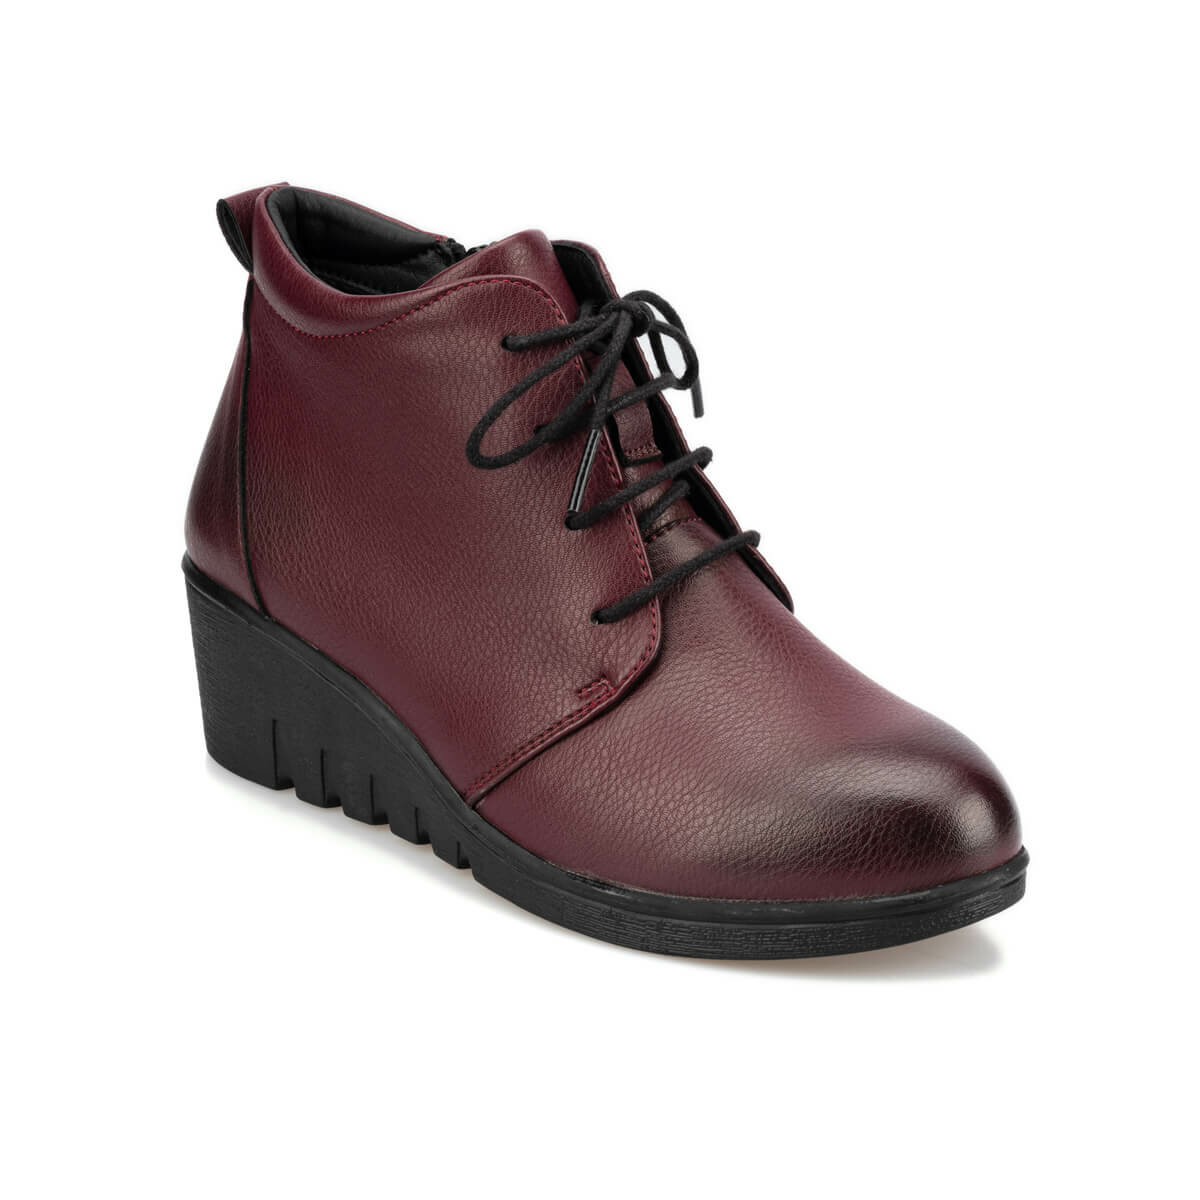 FLO 92.151090.Z Burgundy Women 'S Boots Polaris